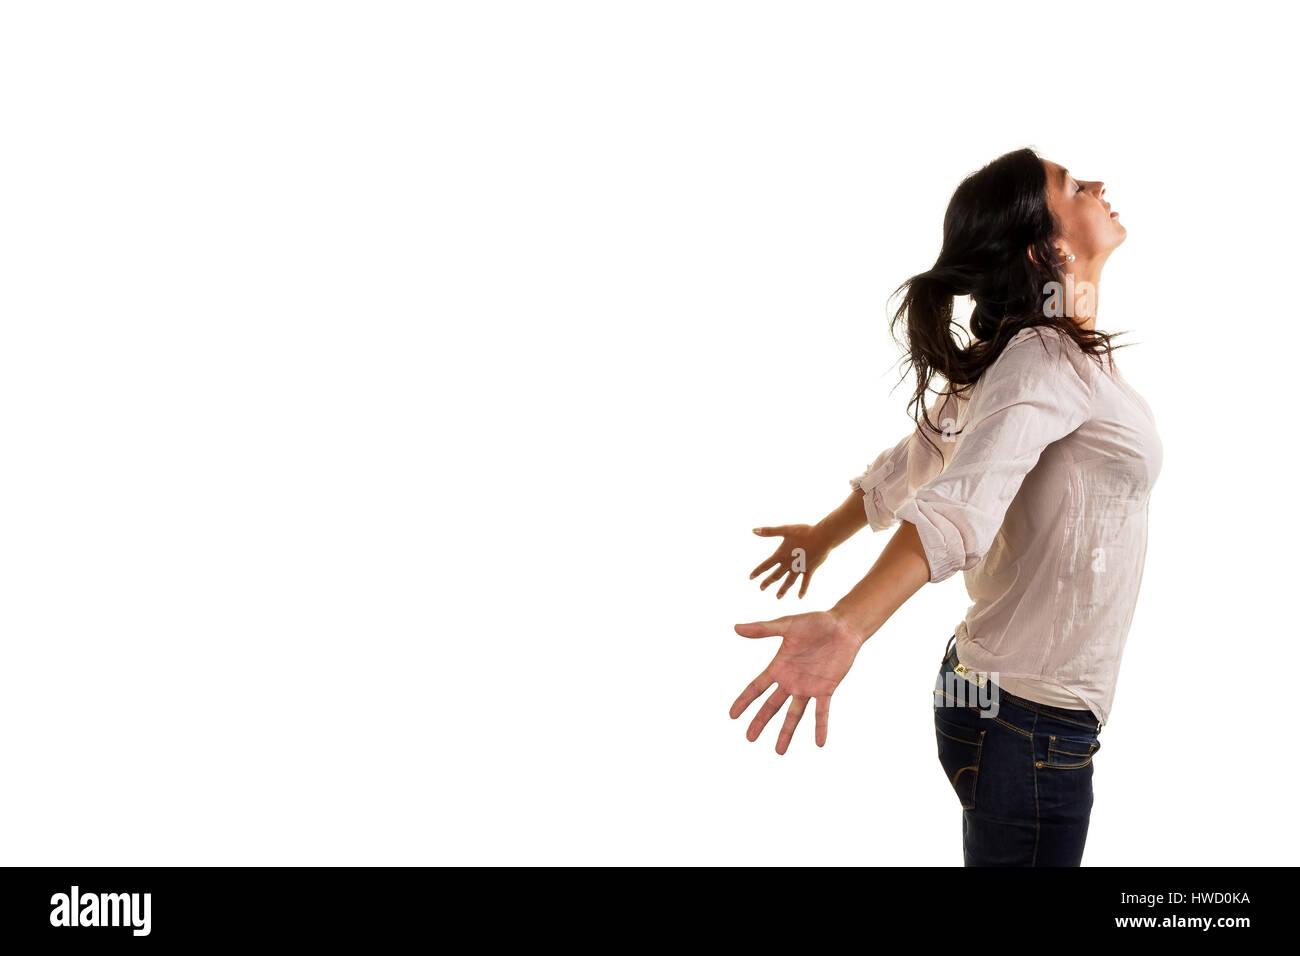 Une jeune femme profondément respire profondément et genius? T sa vie, eine junge Frau atmet tief Photo Stock